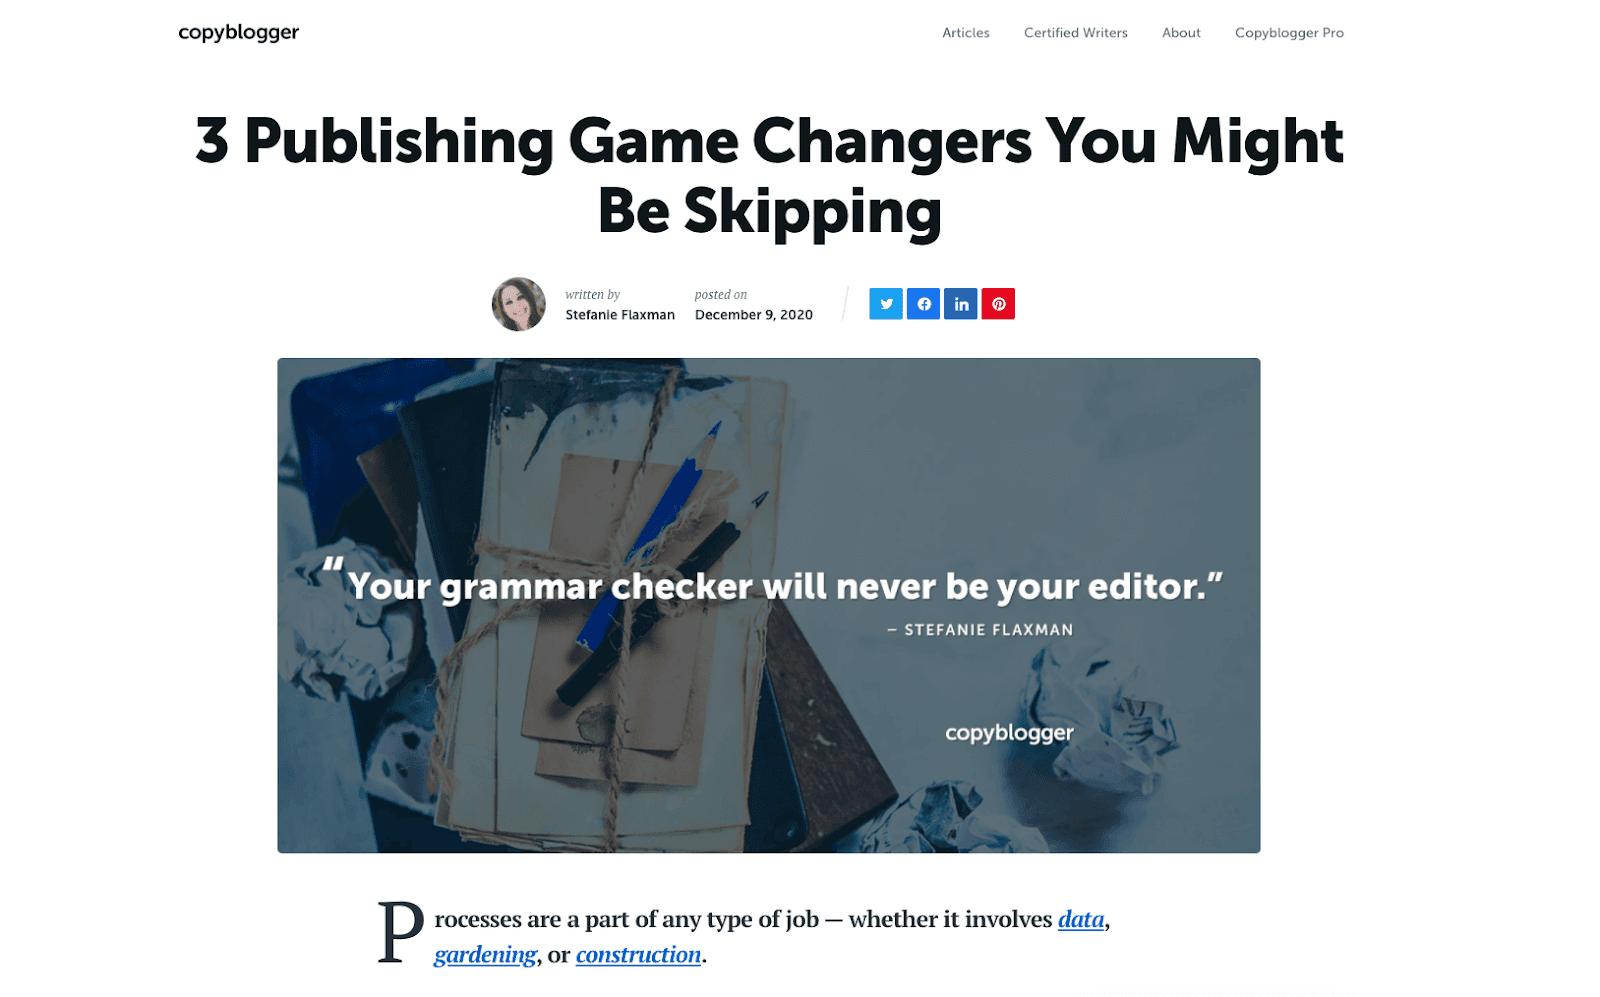 CopyBlogger aligned headline